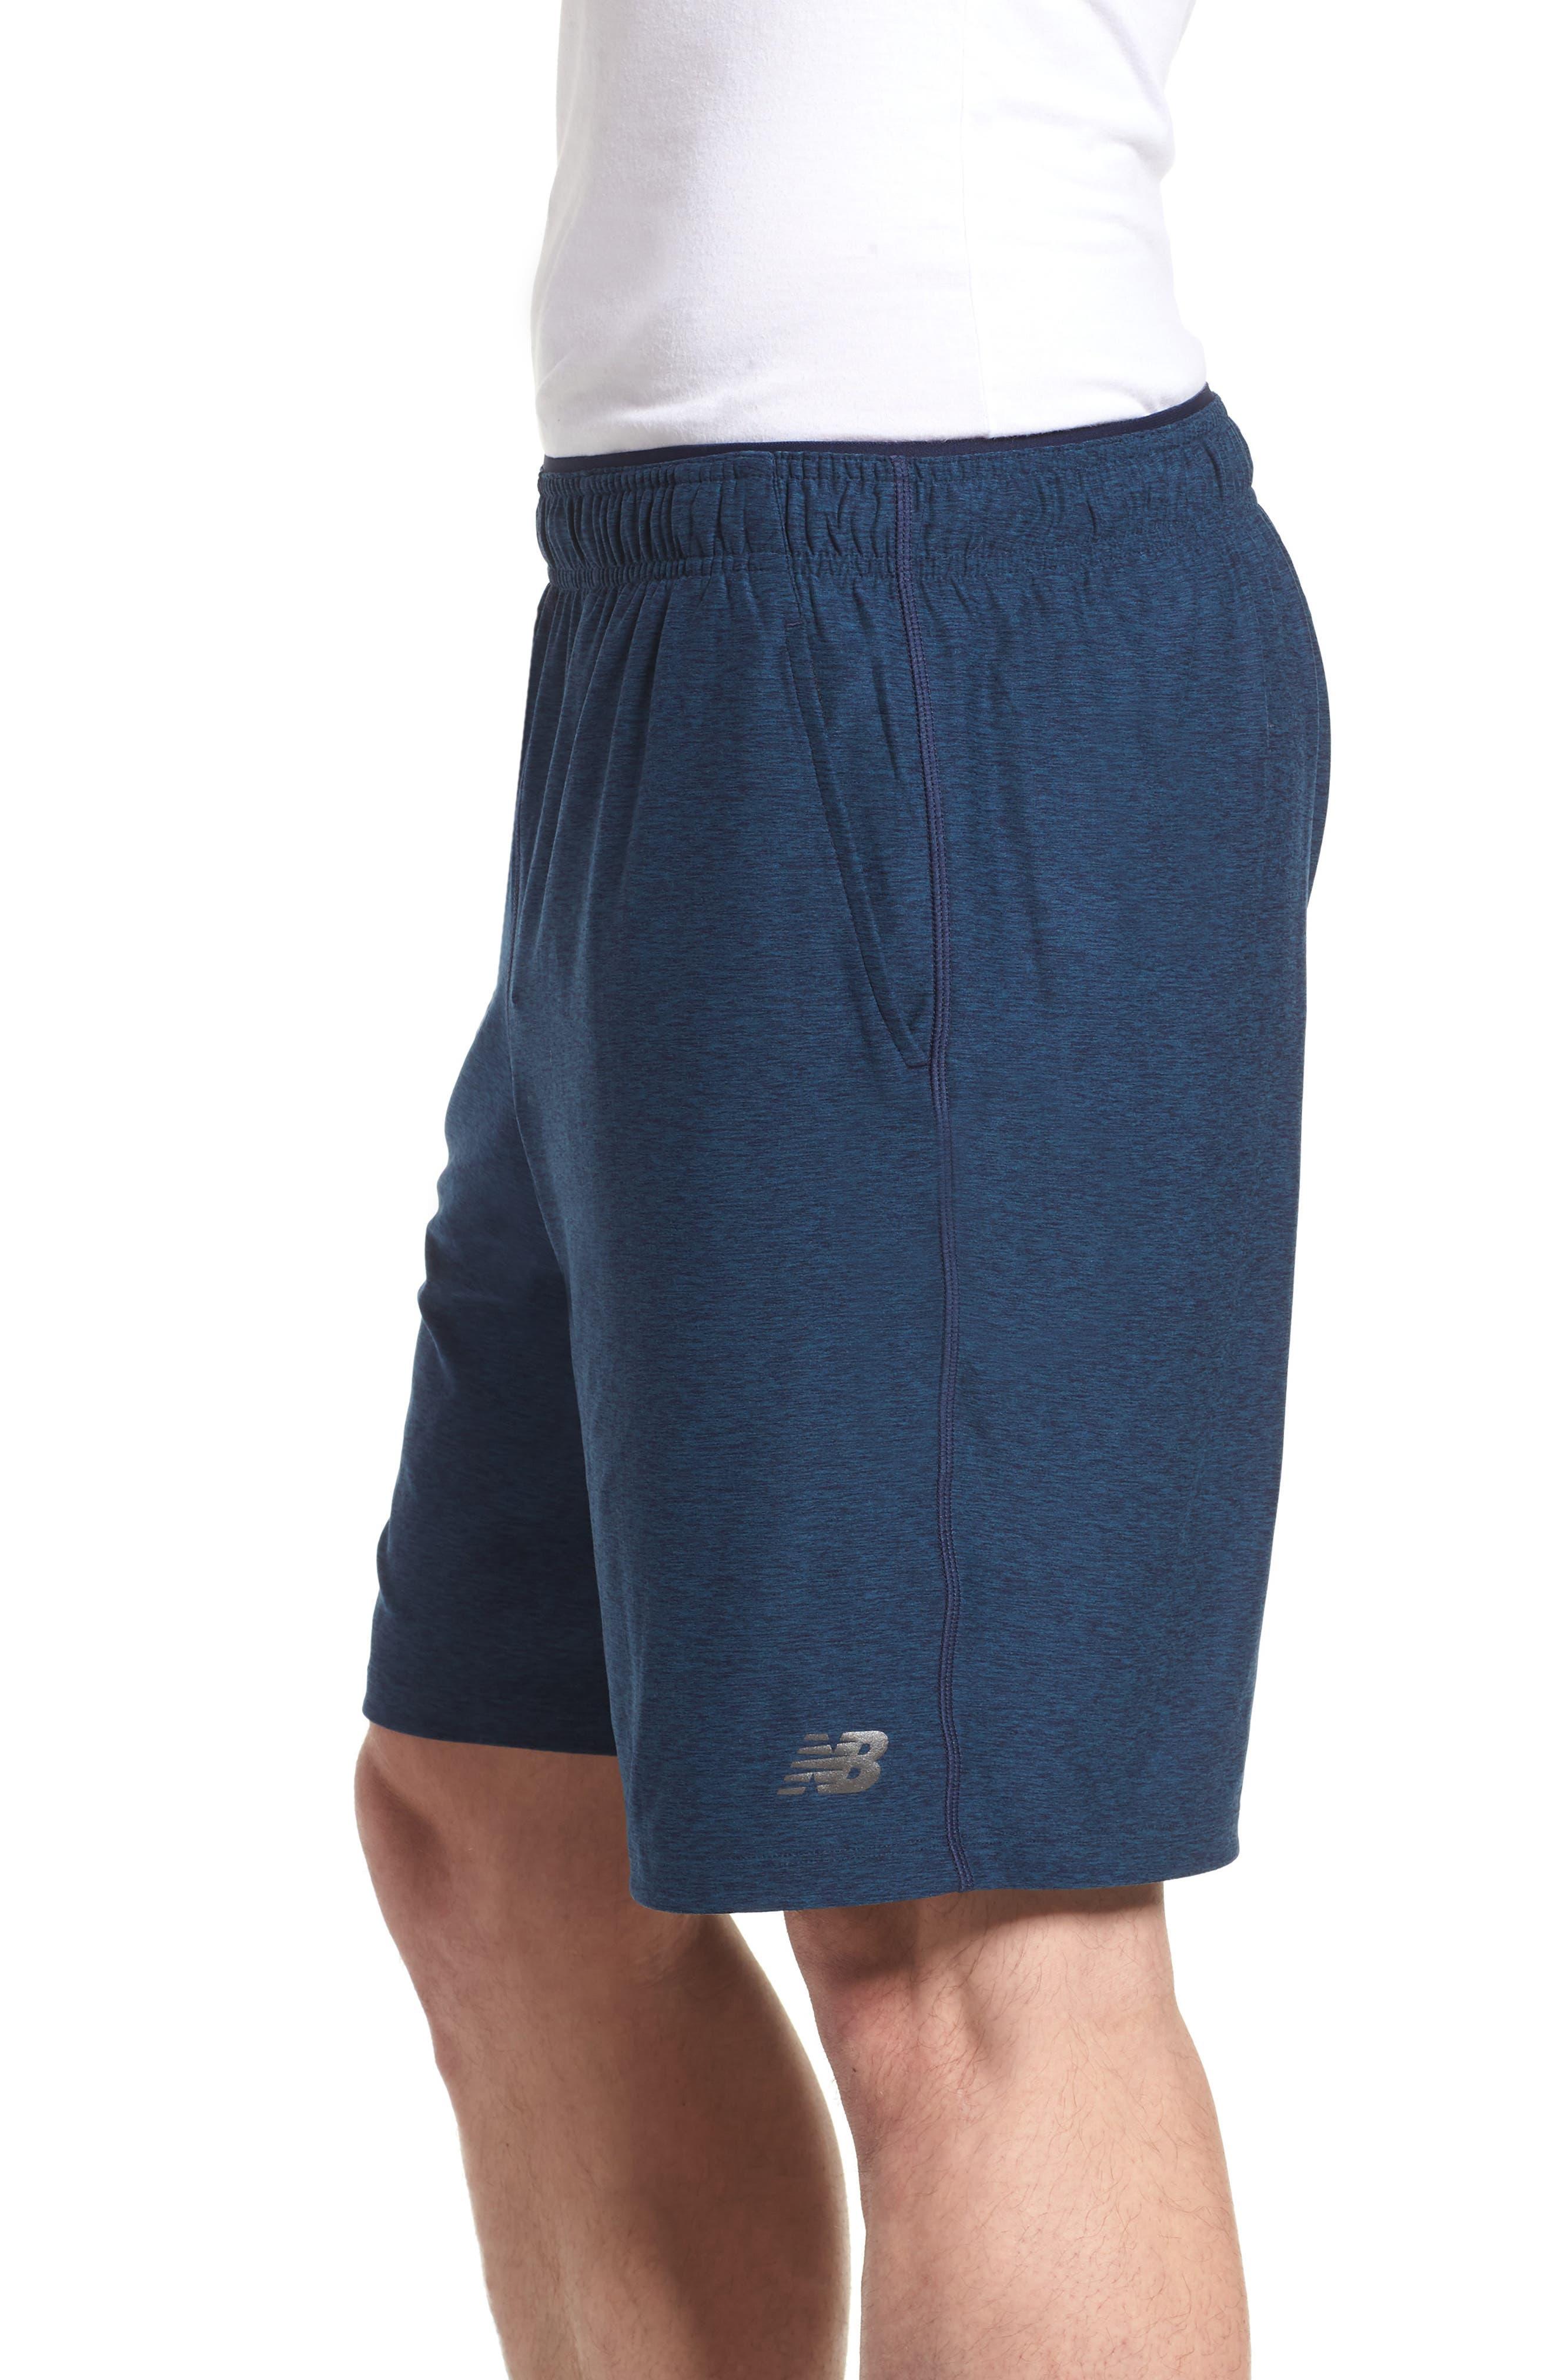 Anticipate Shorts,                             Alternate thumbnail 3, color,                             Pigment